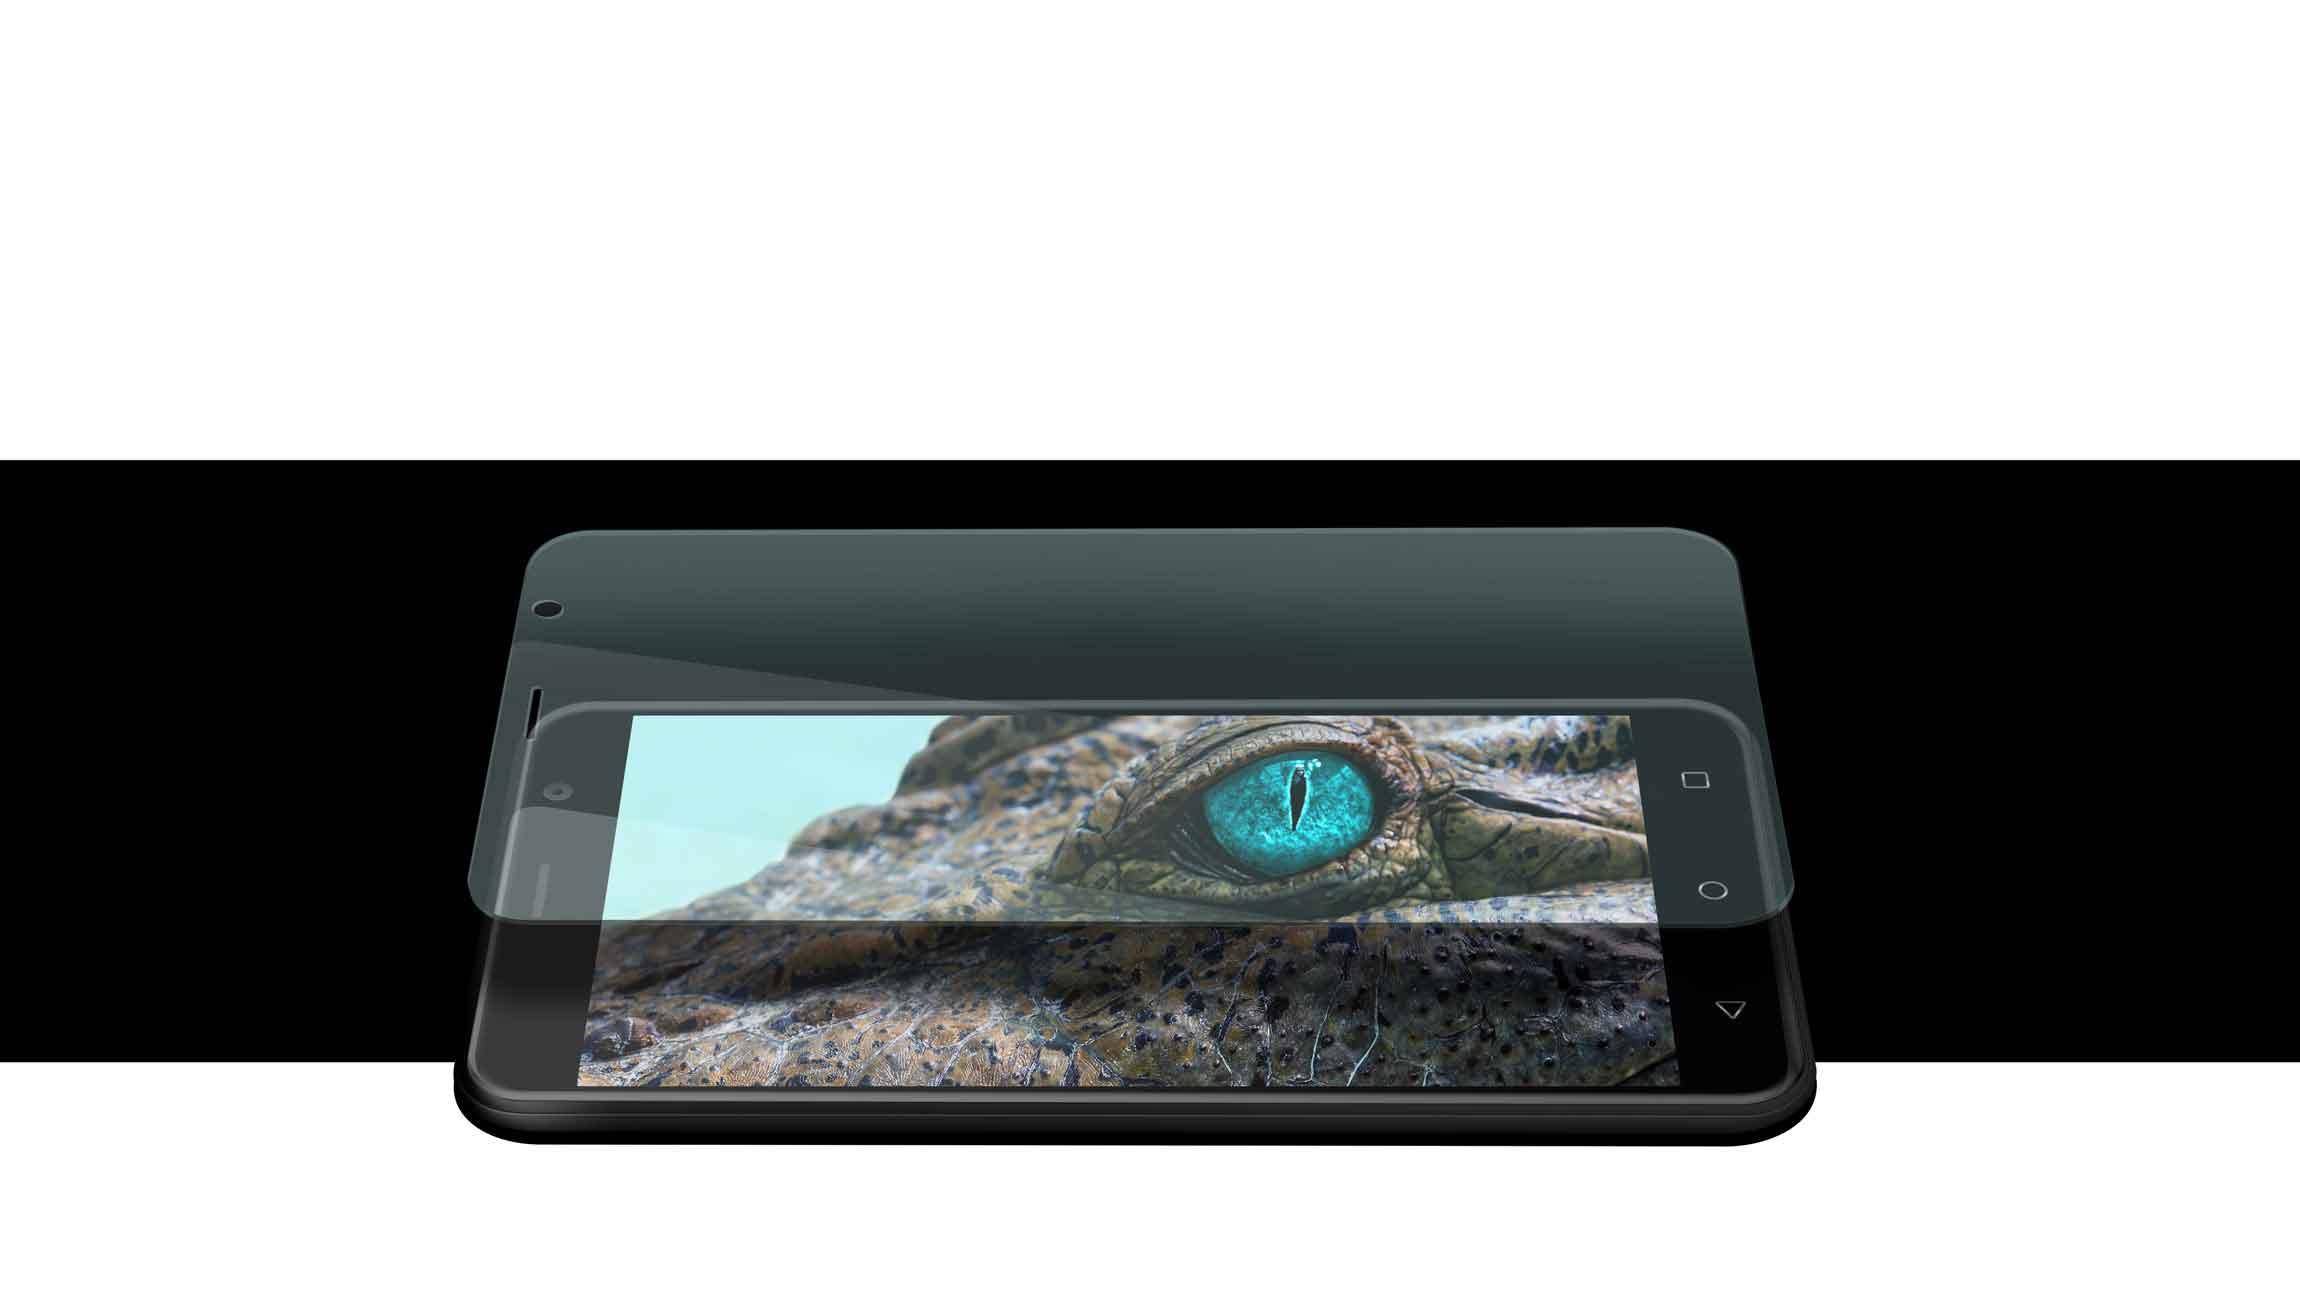 AT E500S screen protector - گوشی موبایل انرجایزر مدل Energizer Energy E500S با ظرفیت ۸ گیگابایت